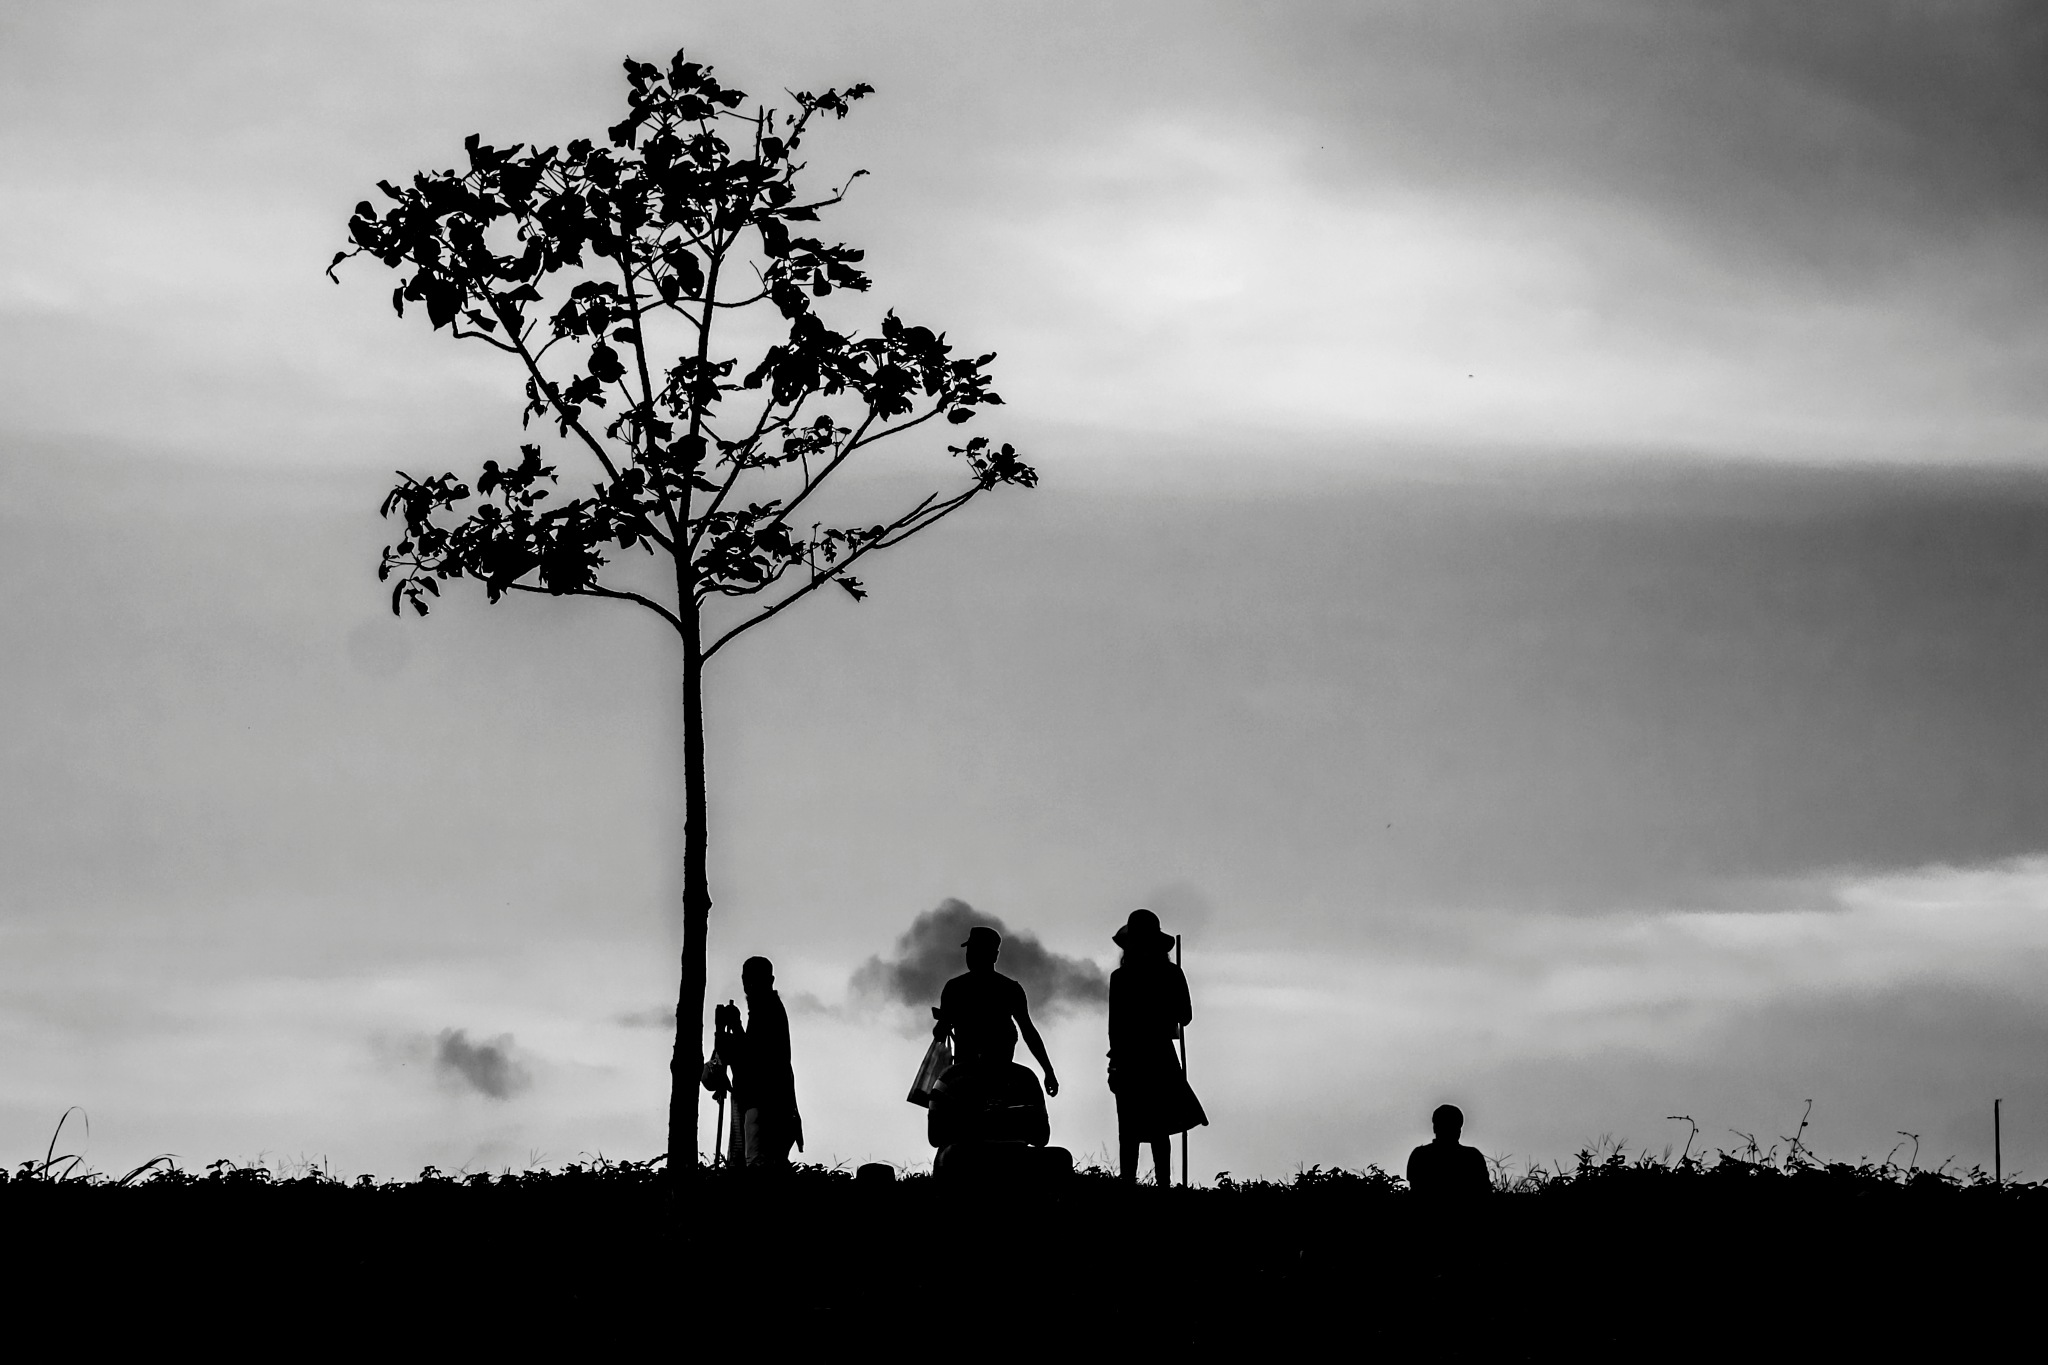 An evening in Sajek valley. by Arunkumar Banik